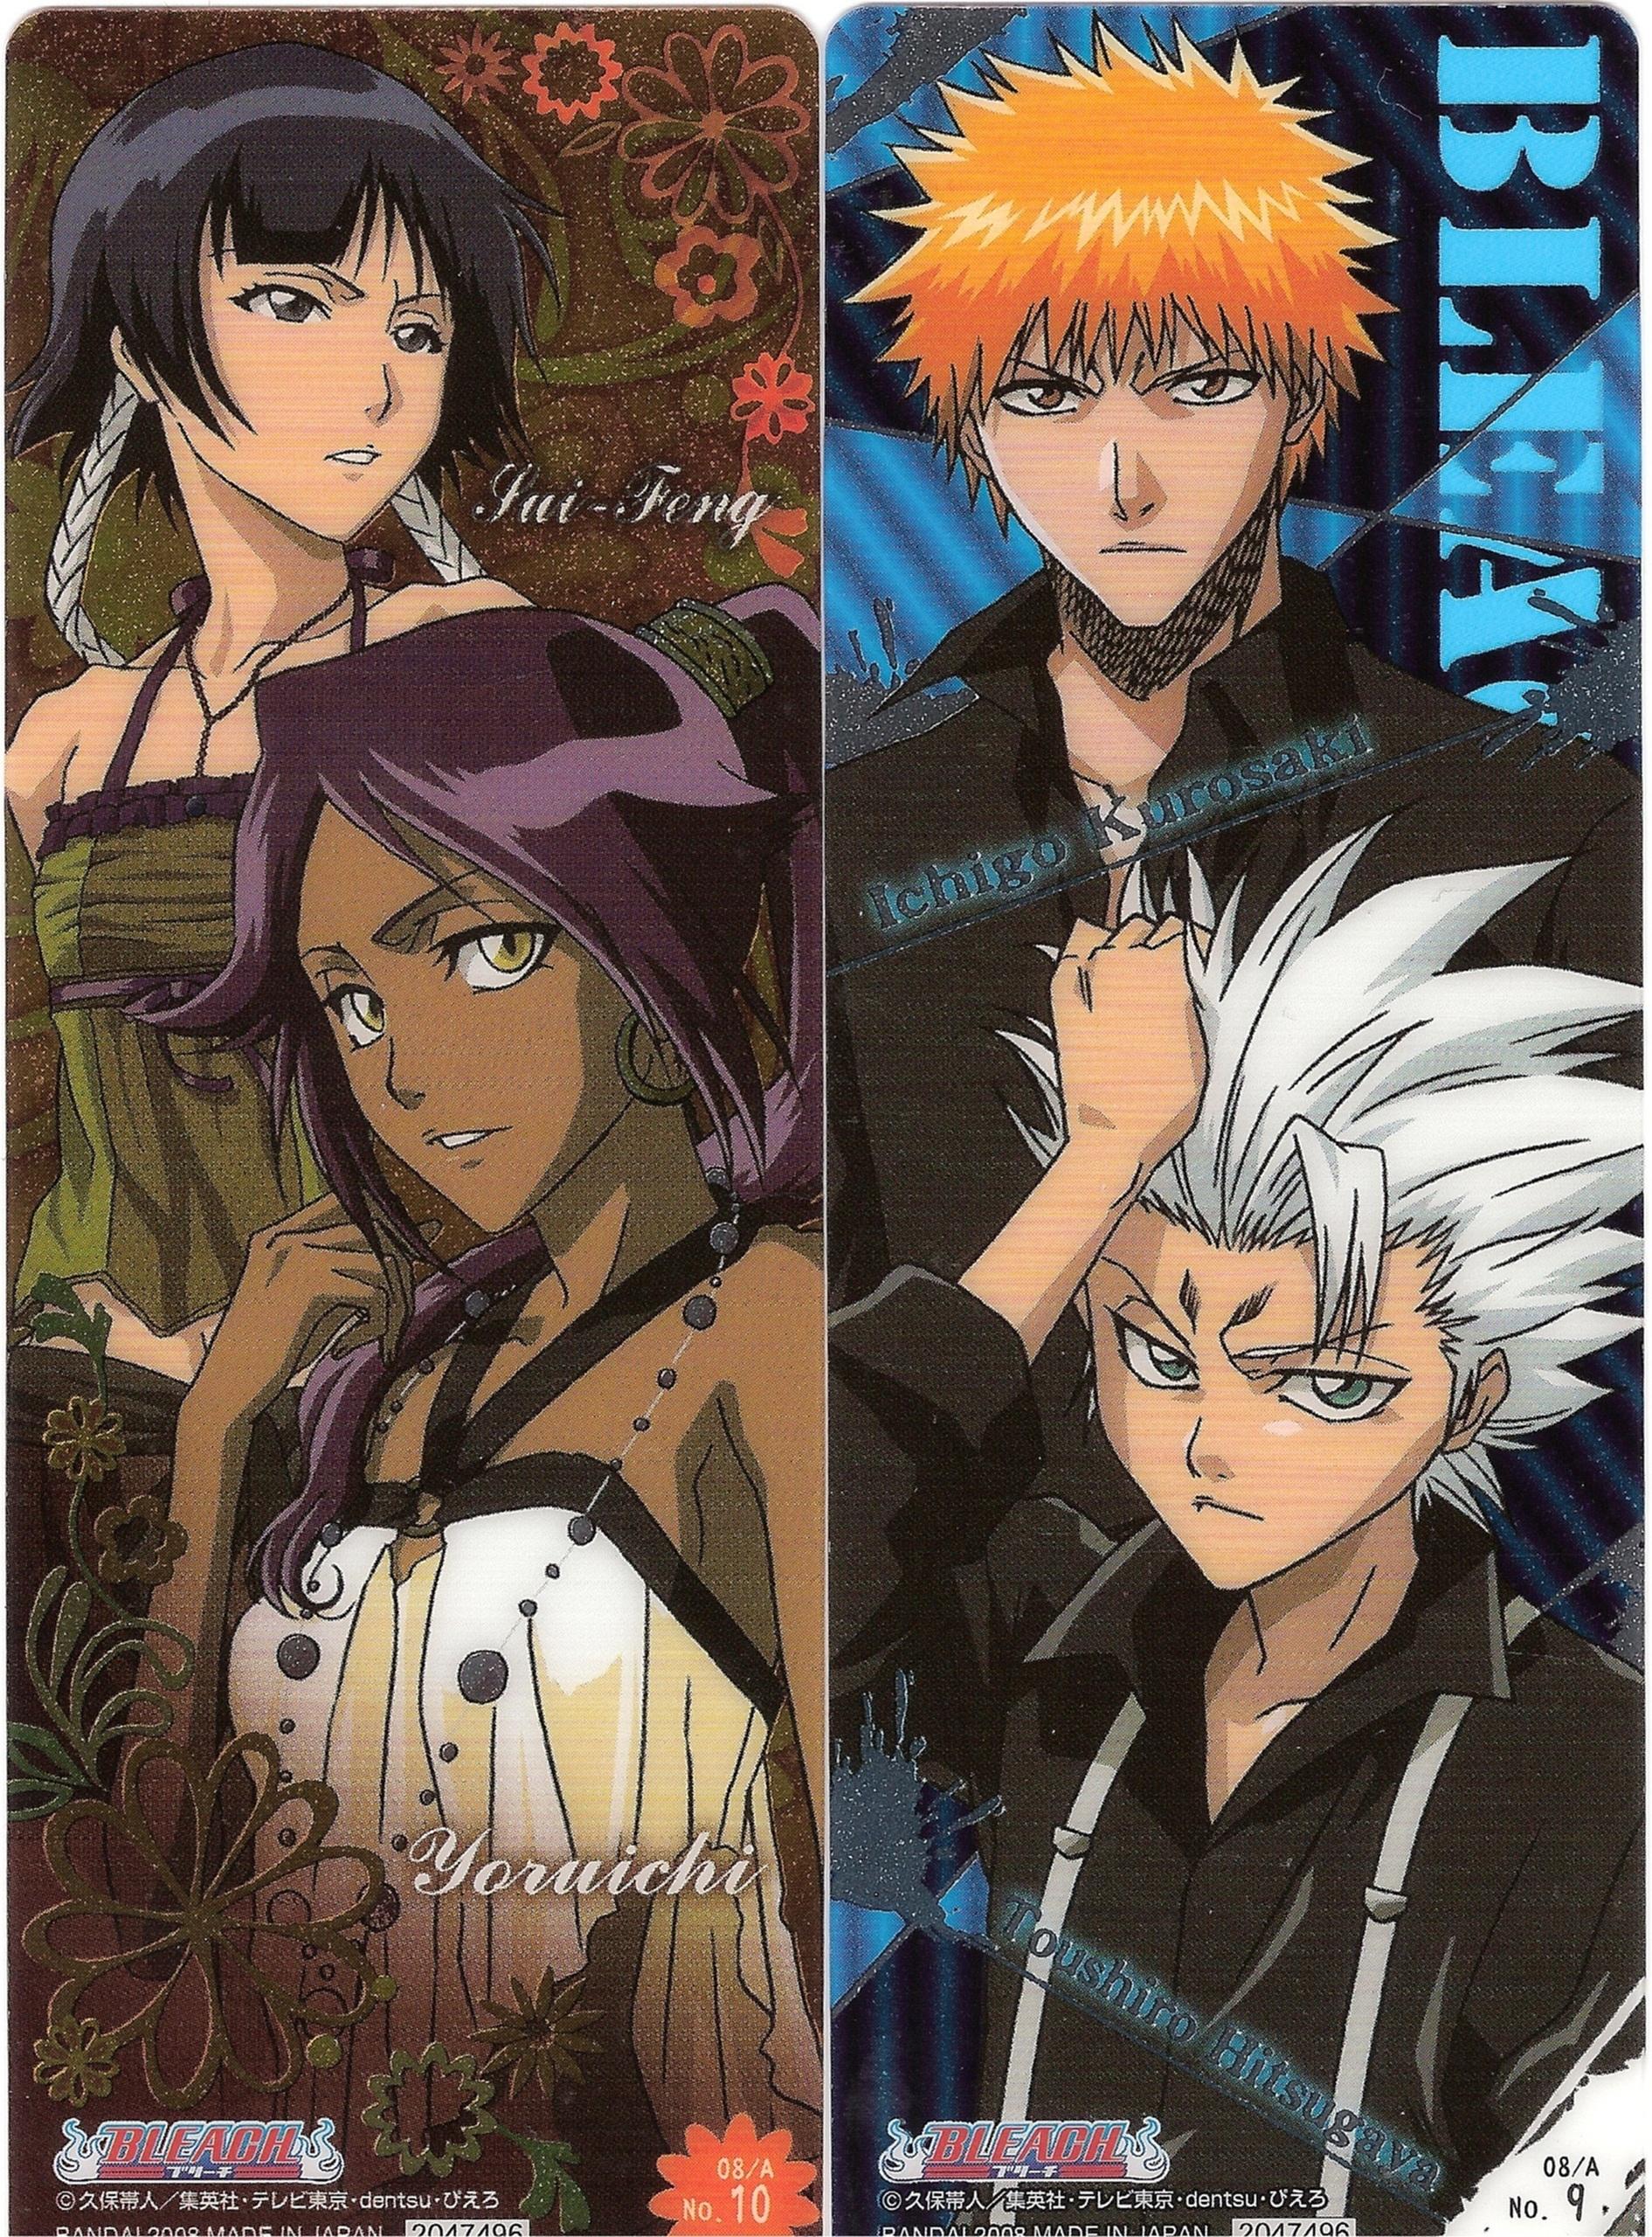 download its about Bleach Anime Soifon Yoruichi Ichigo Toshirou pic